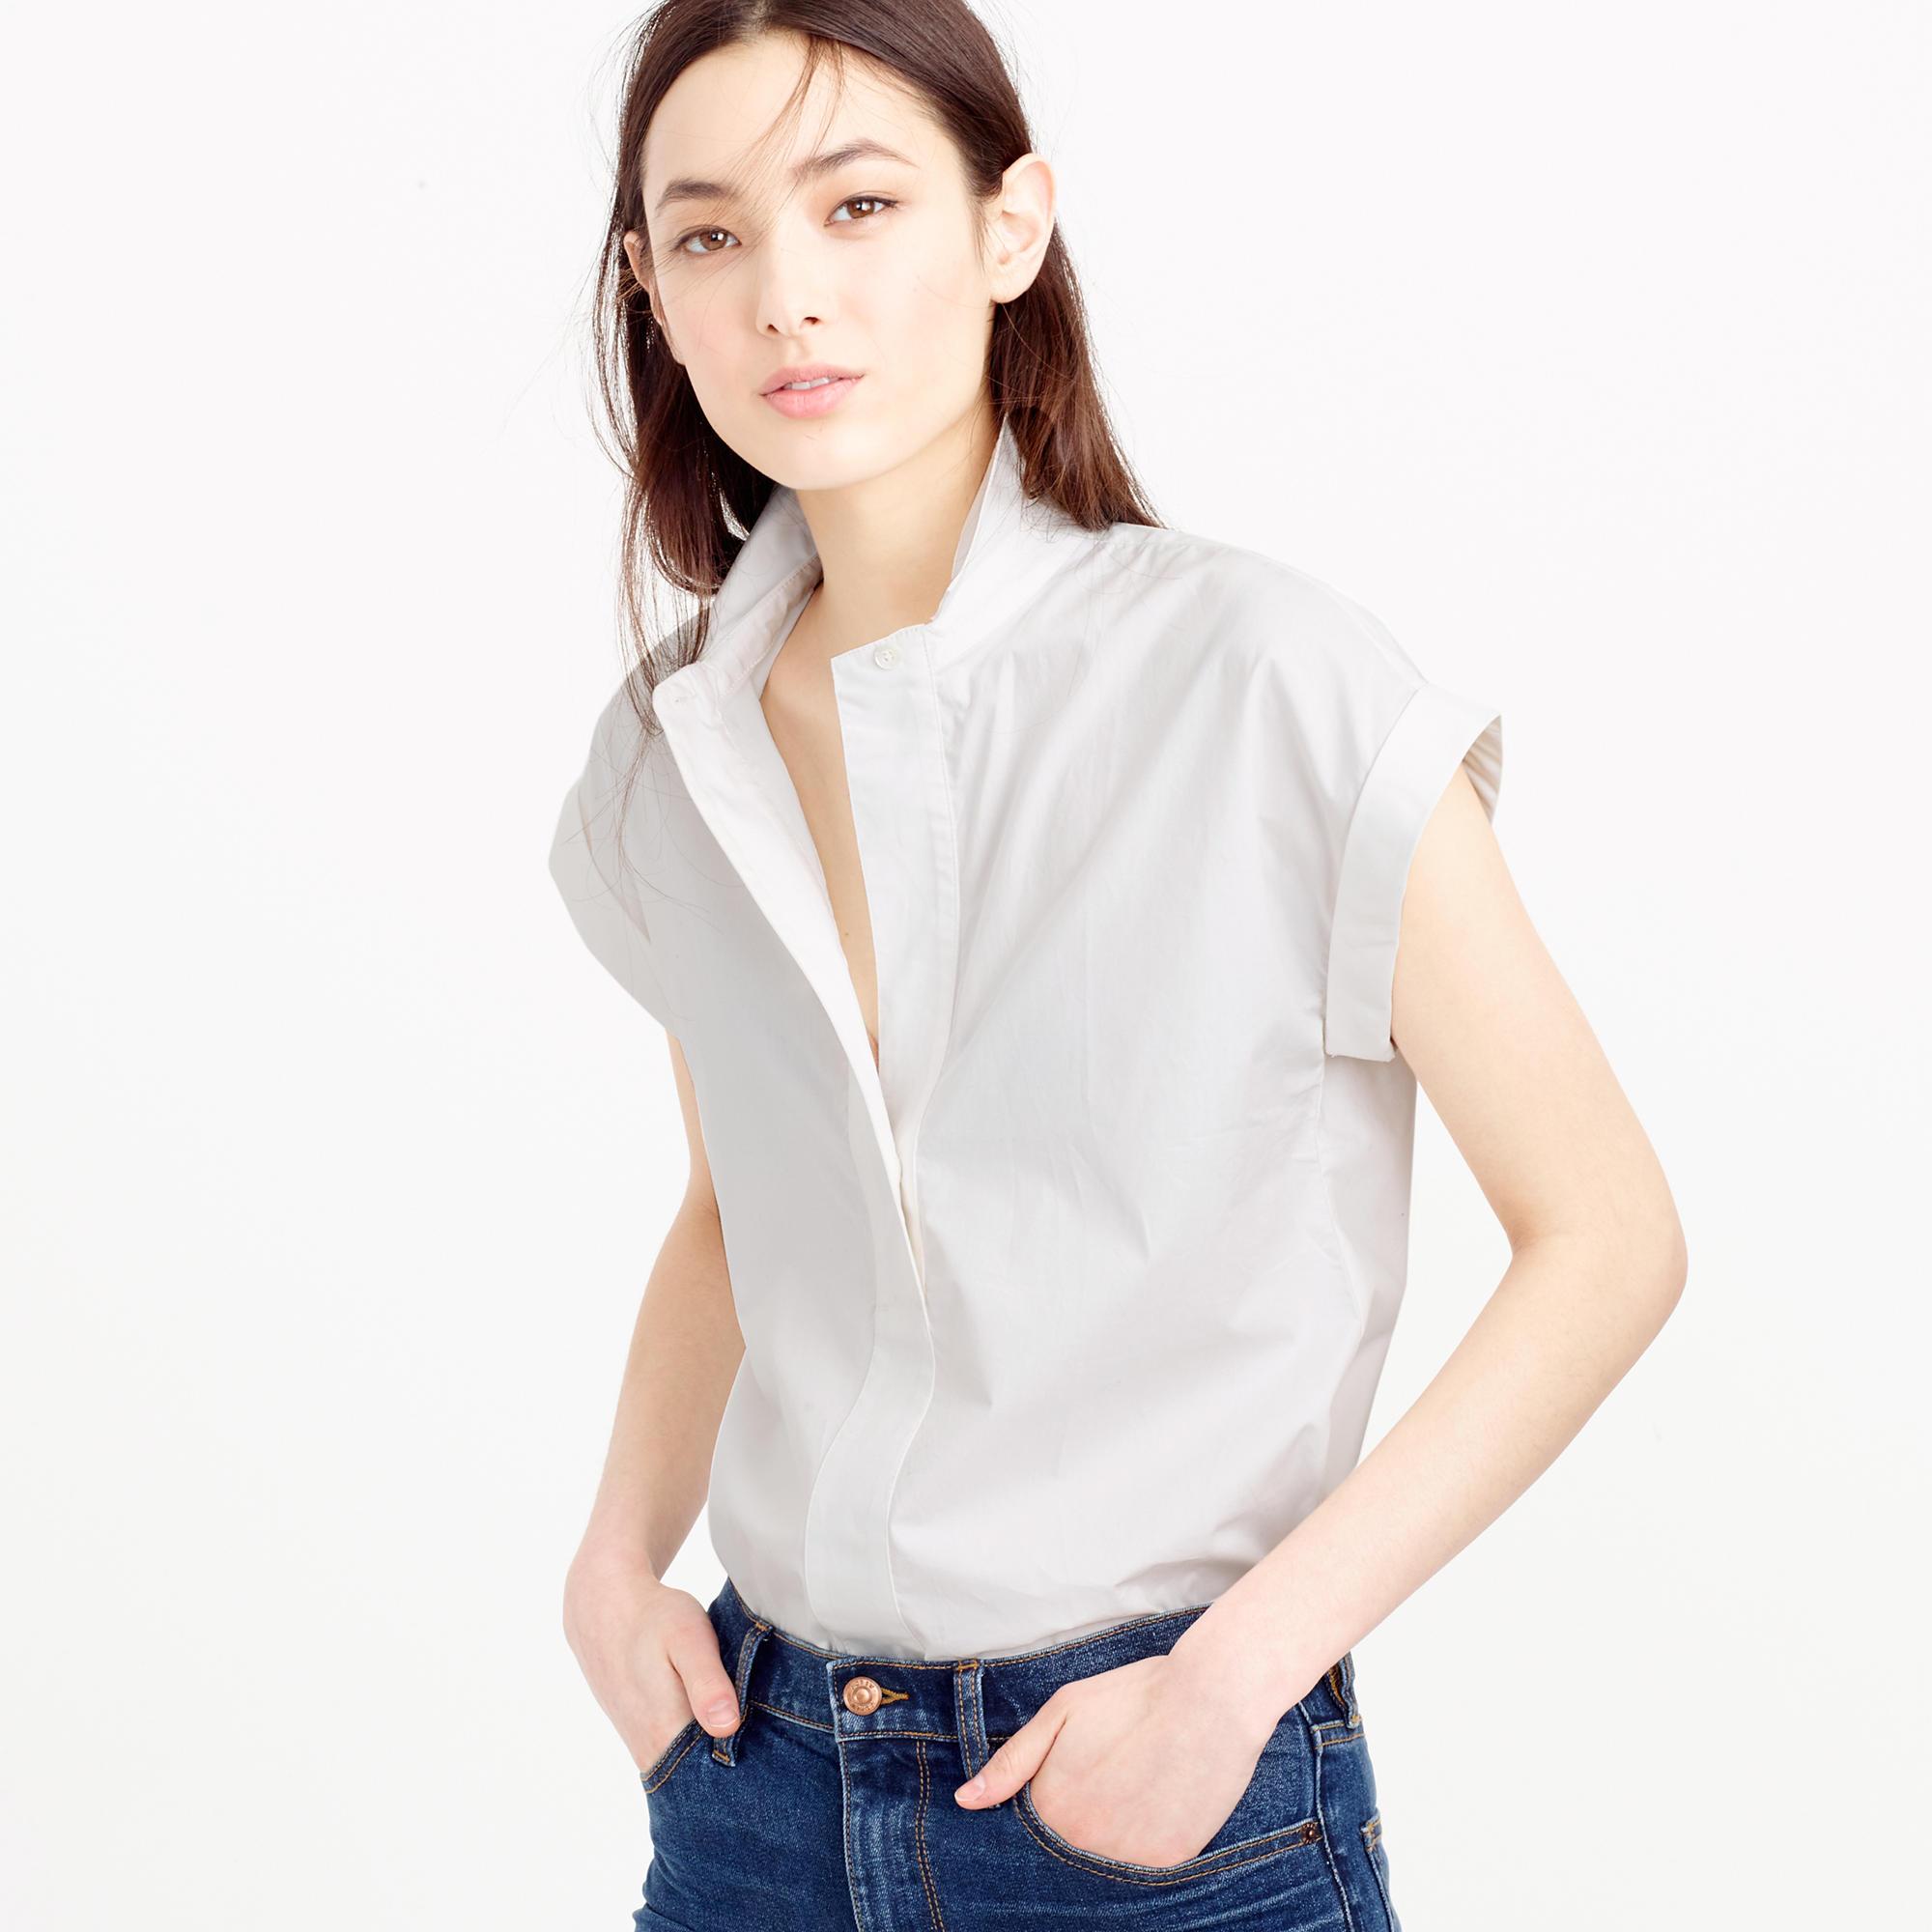 Petite Short-Sleeve Popover Shirt : Women's Shirts | J.Crew